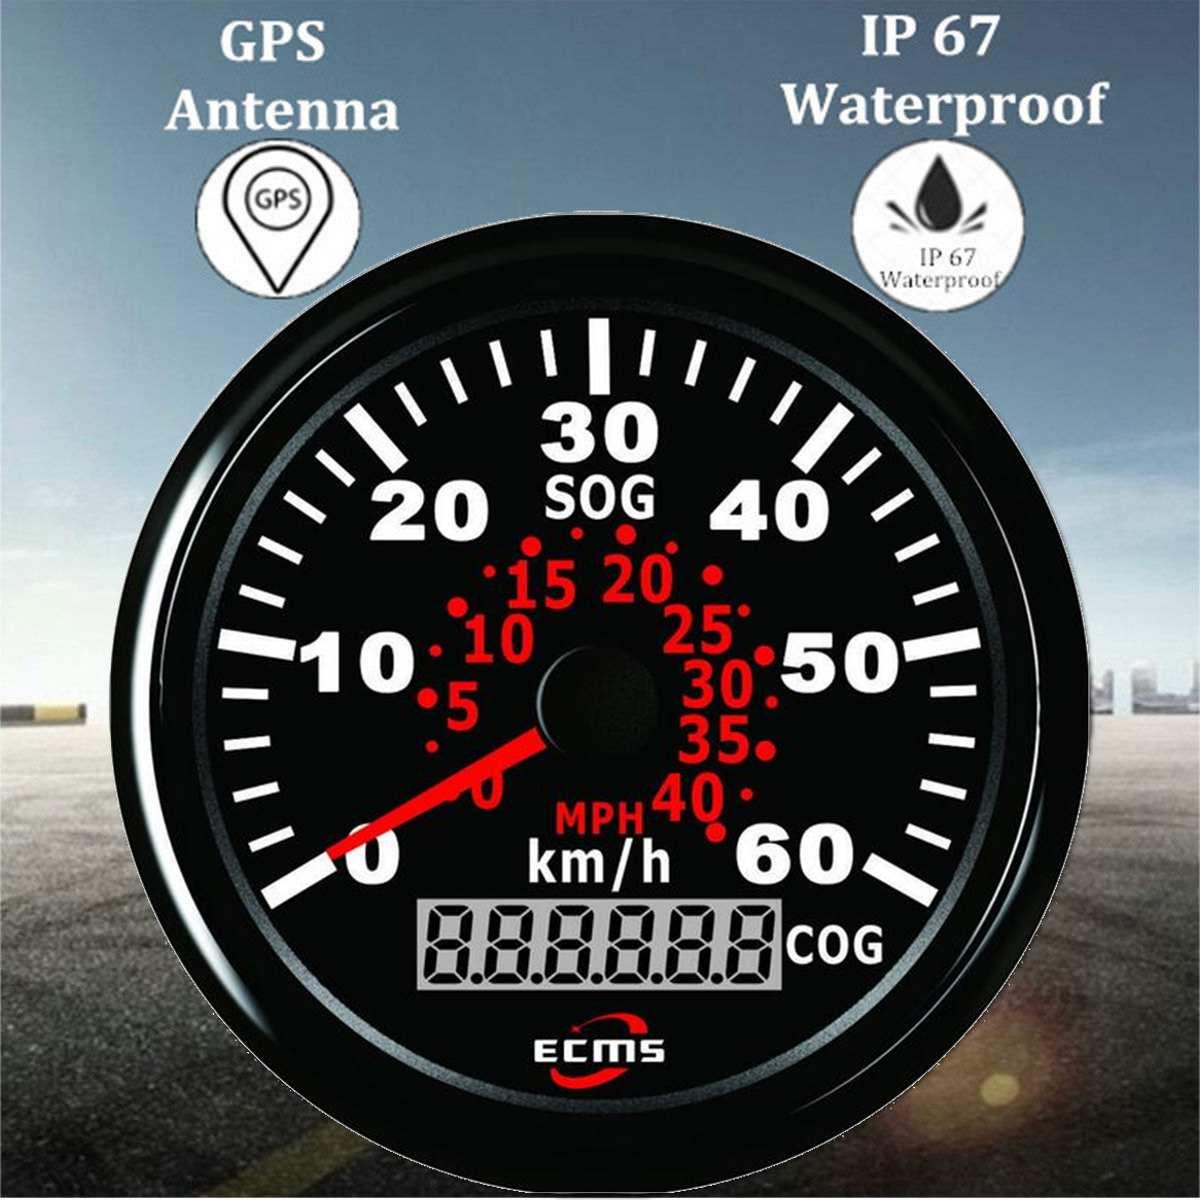 85mm Auto Car Truck Marine GPS Speedometer Waterproof Speed Sensor Meter Gauge Digital Odometer Automobiles Replacement Parts 4